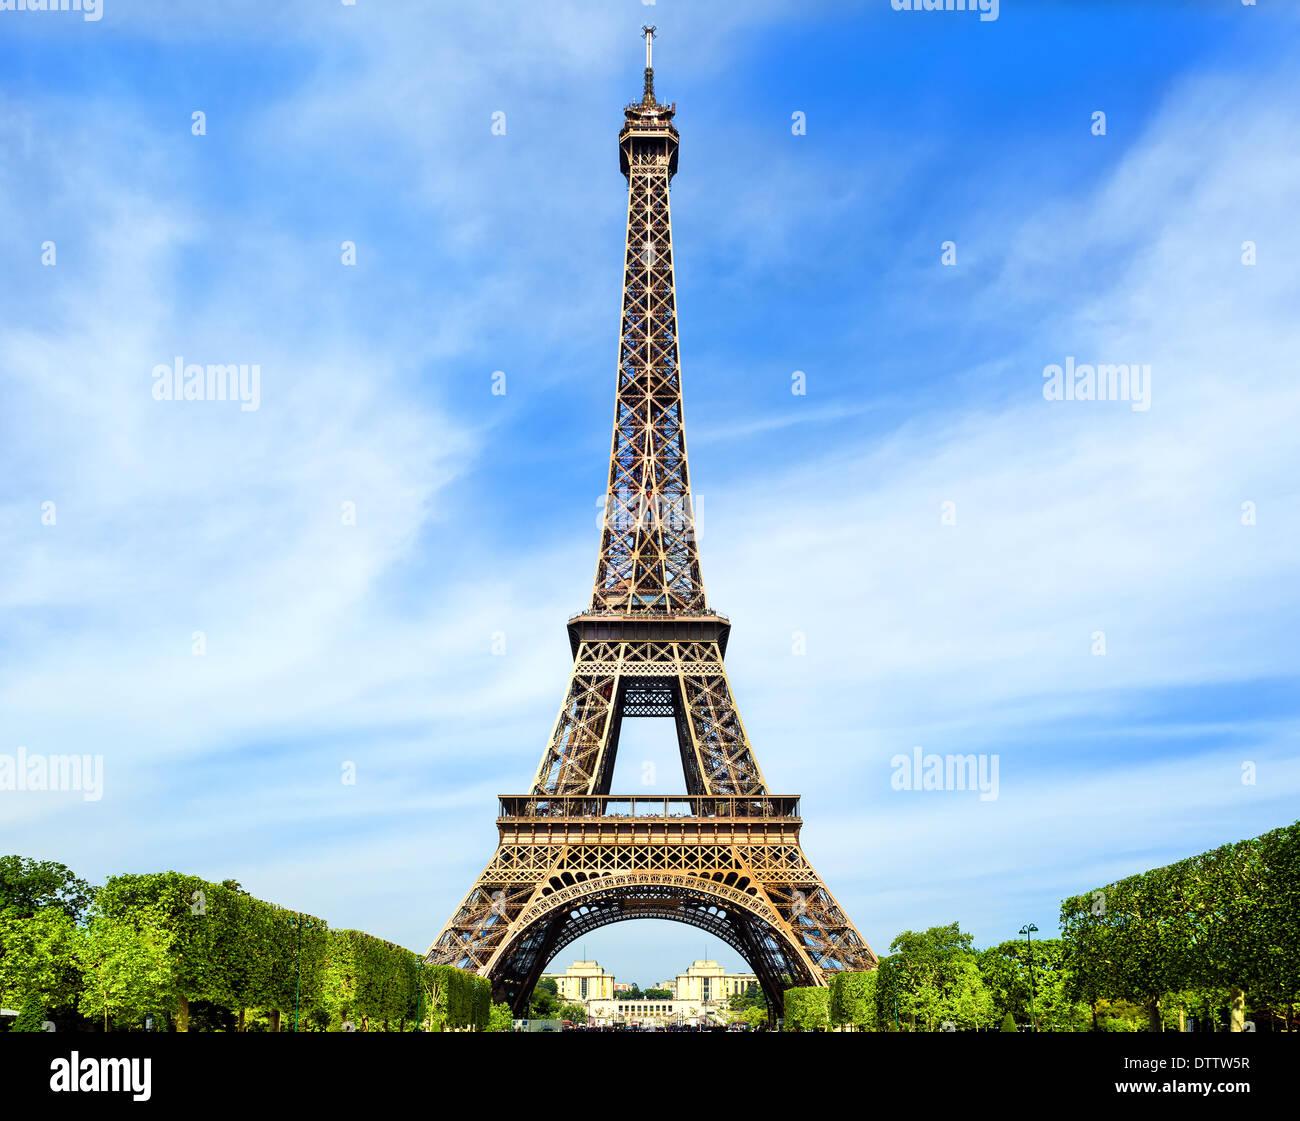 Fantastica Torre Eiffel a Parigi Immagini Stock